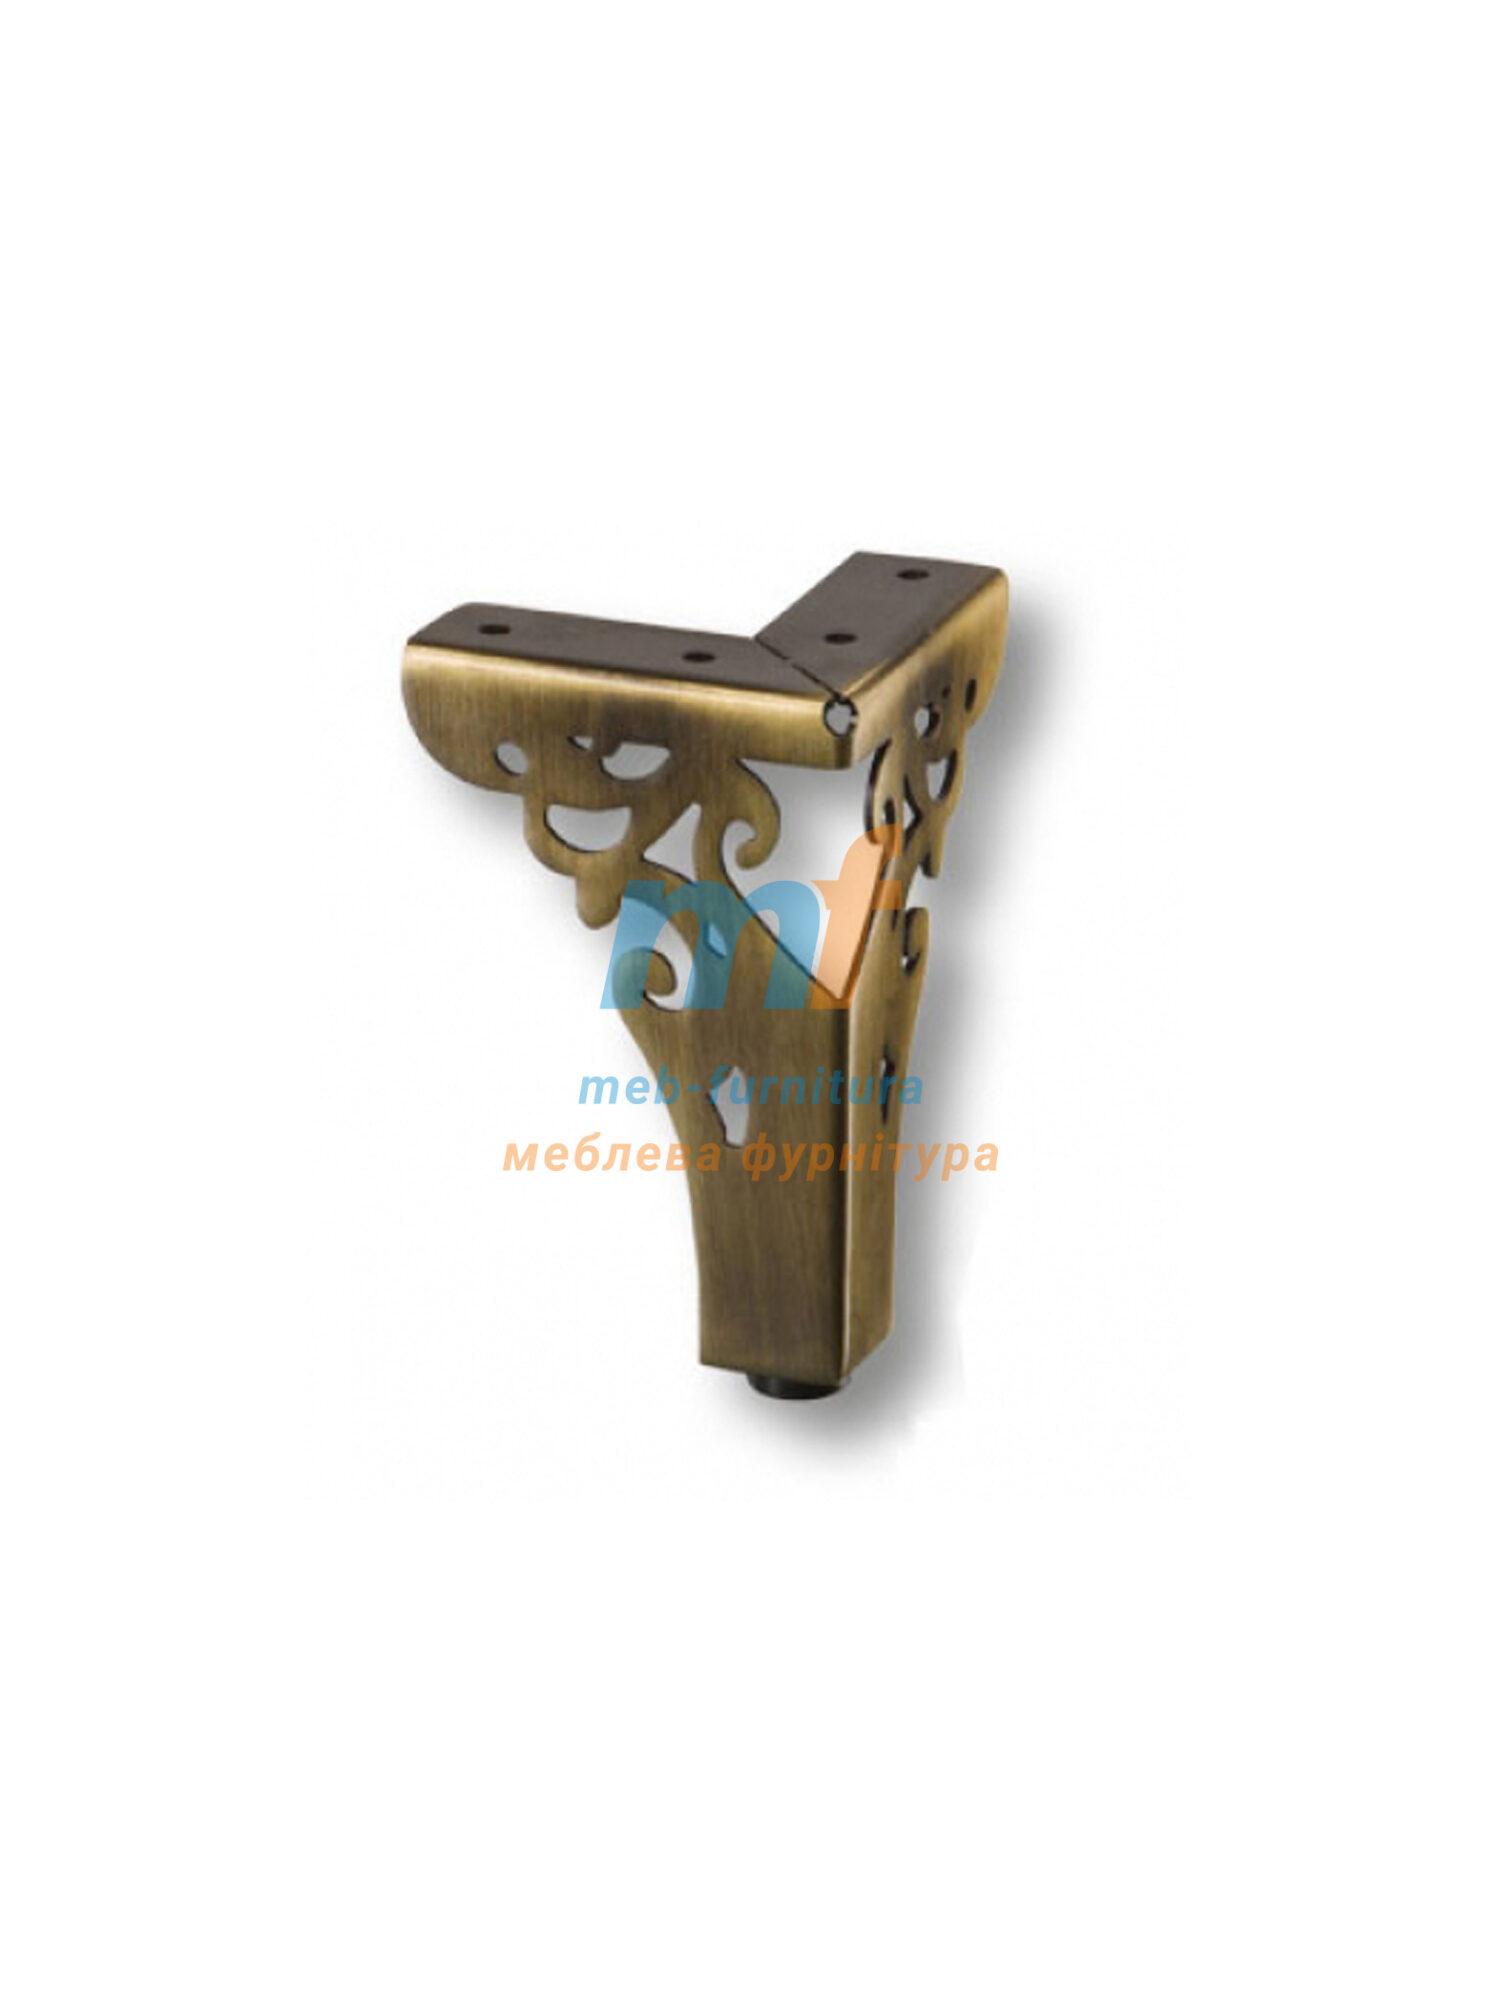 Опора мебельная декоративная 100мм бронза Турция